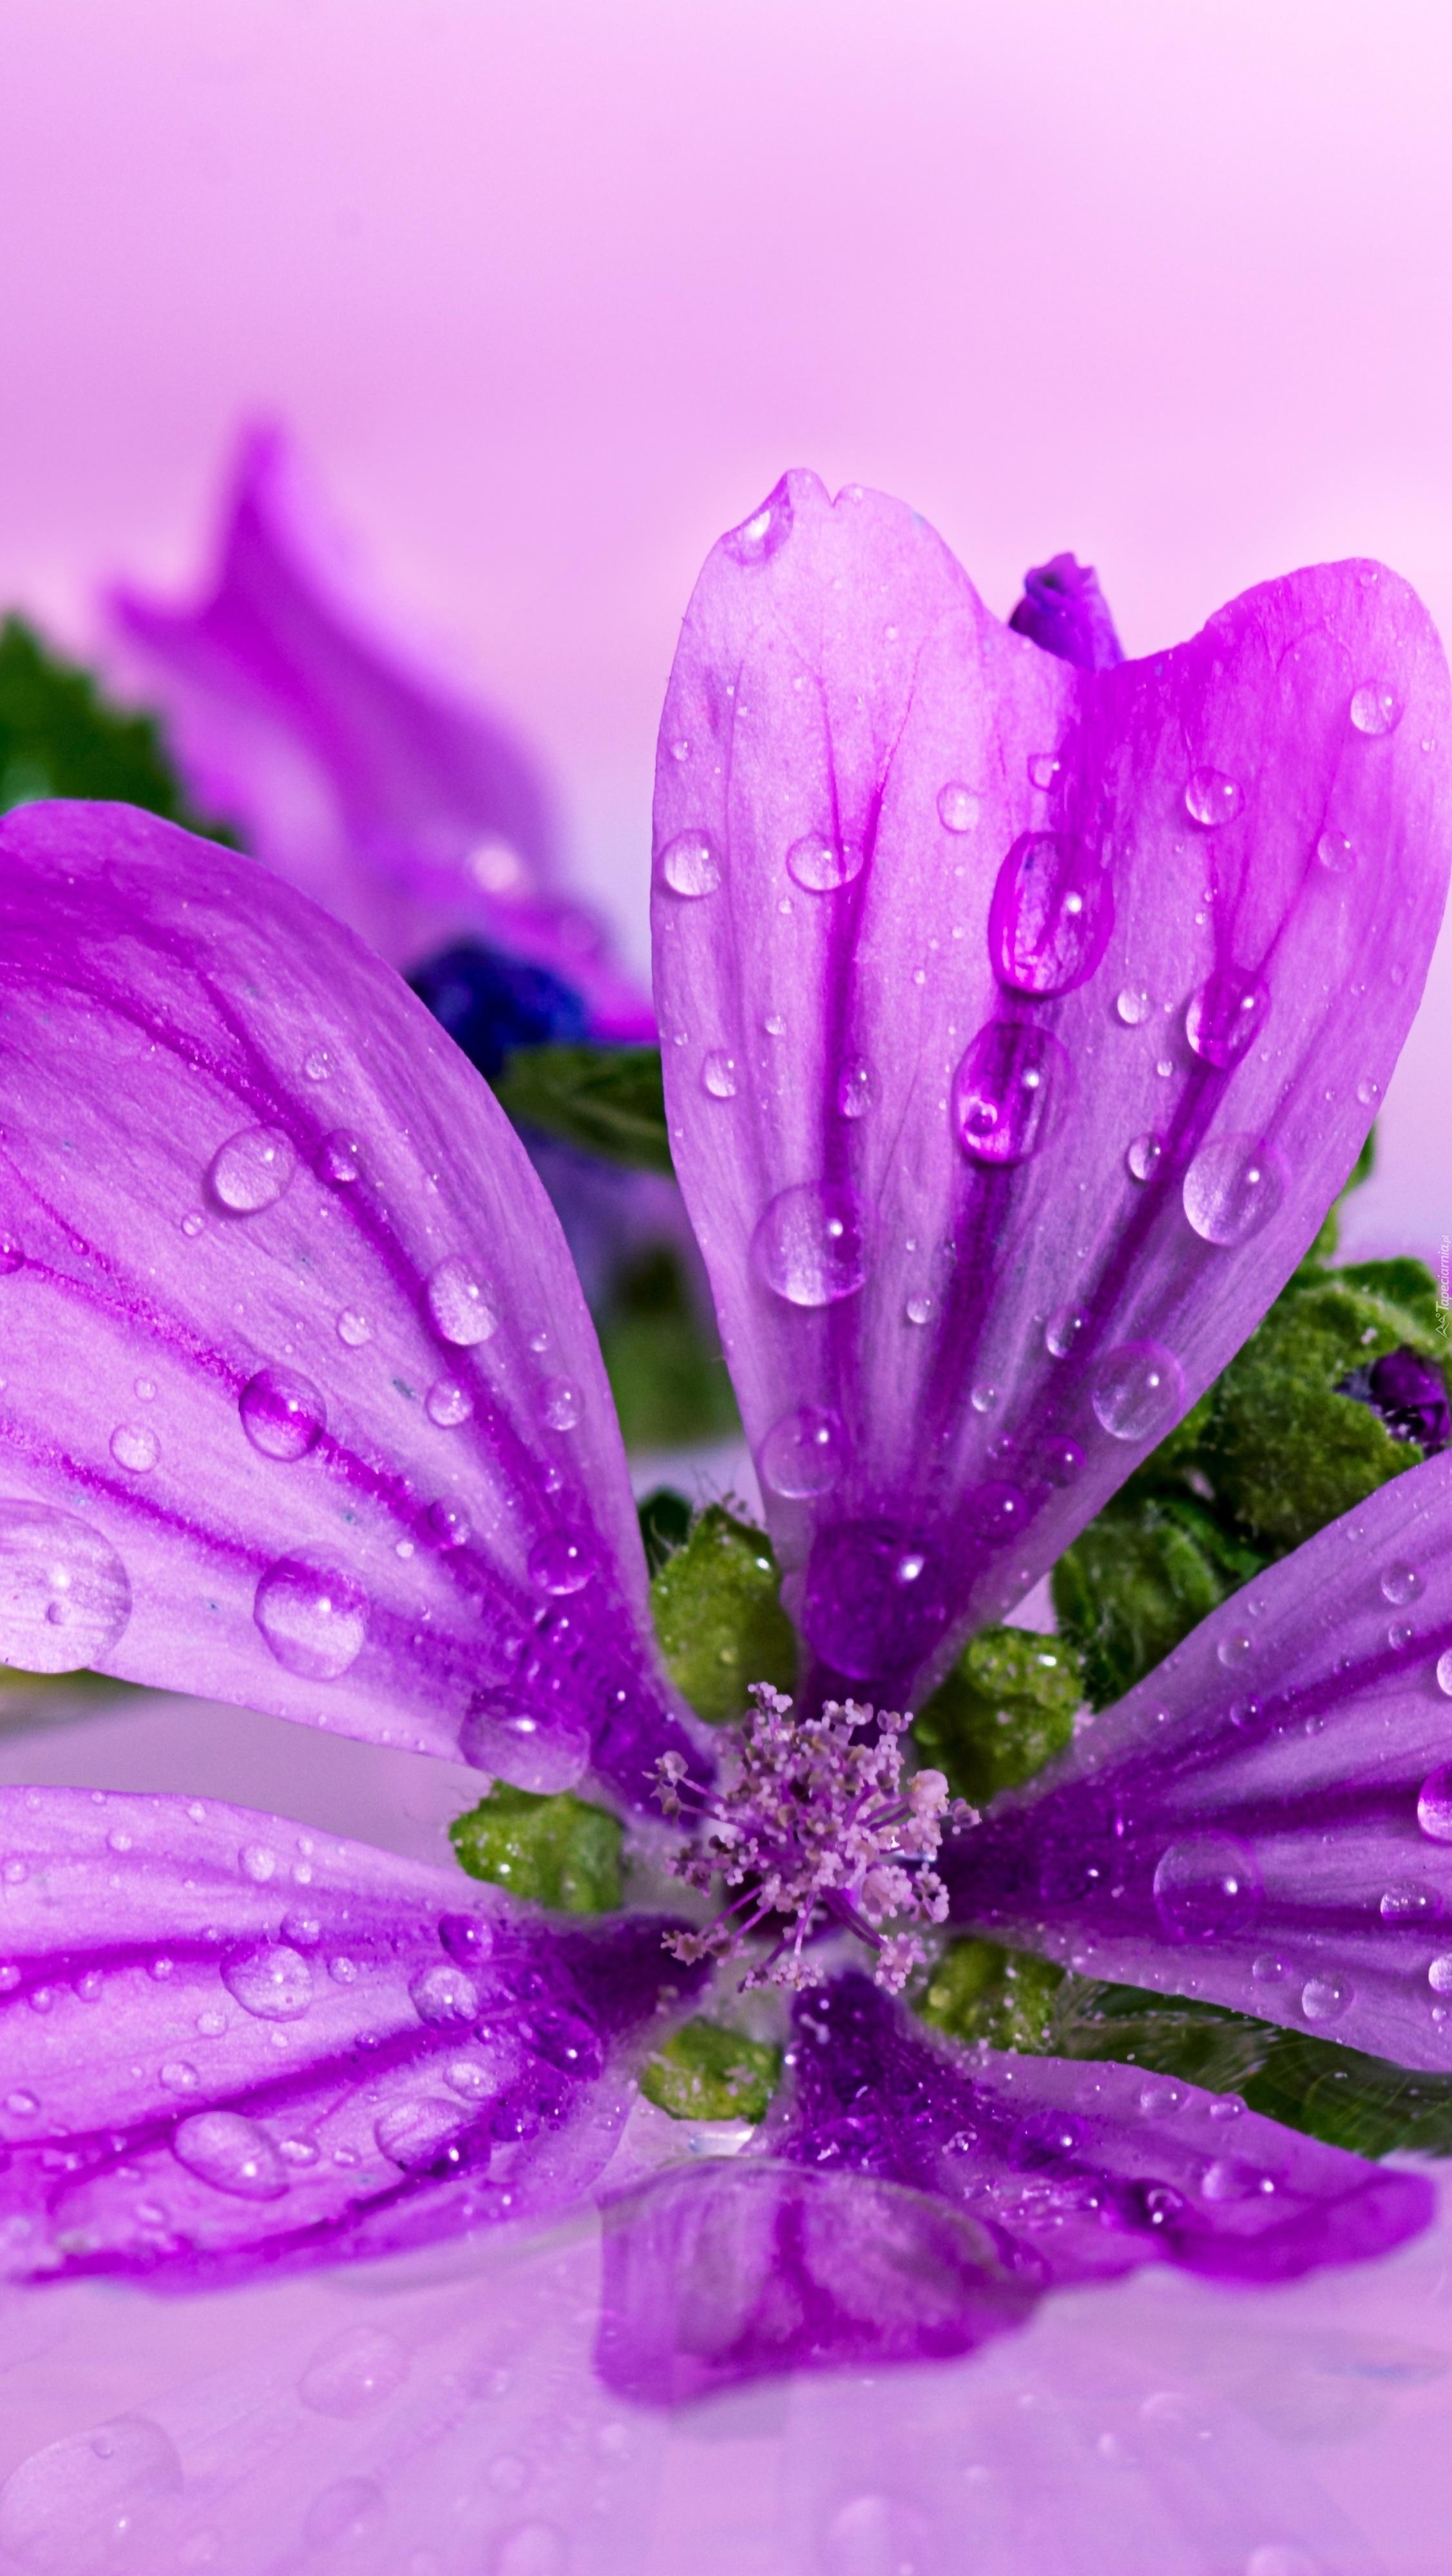 Kwiat w kroplach wody